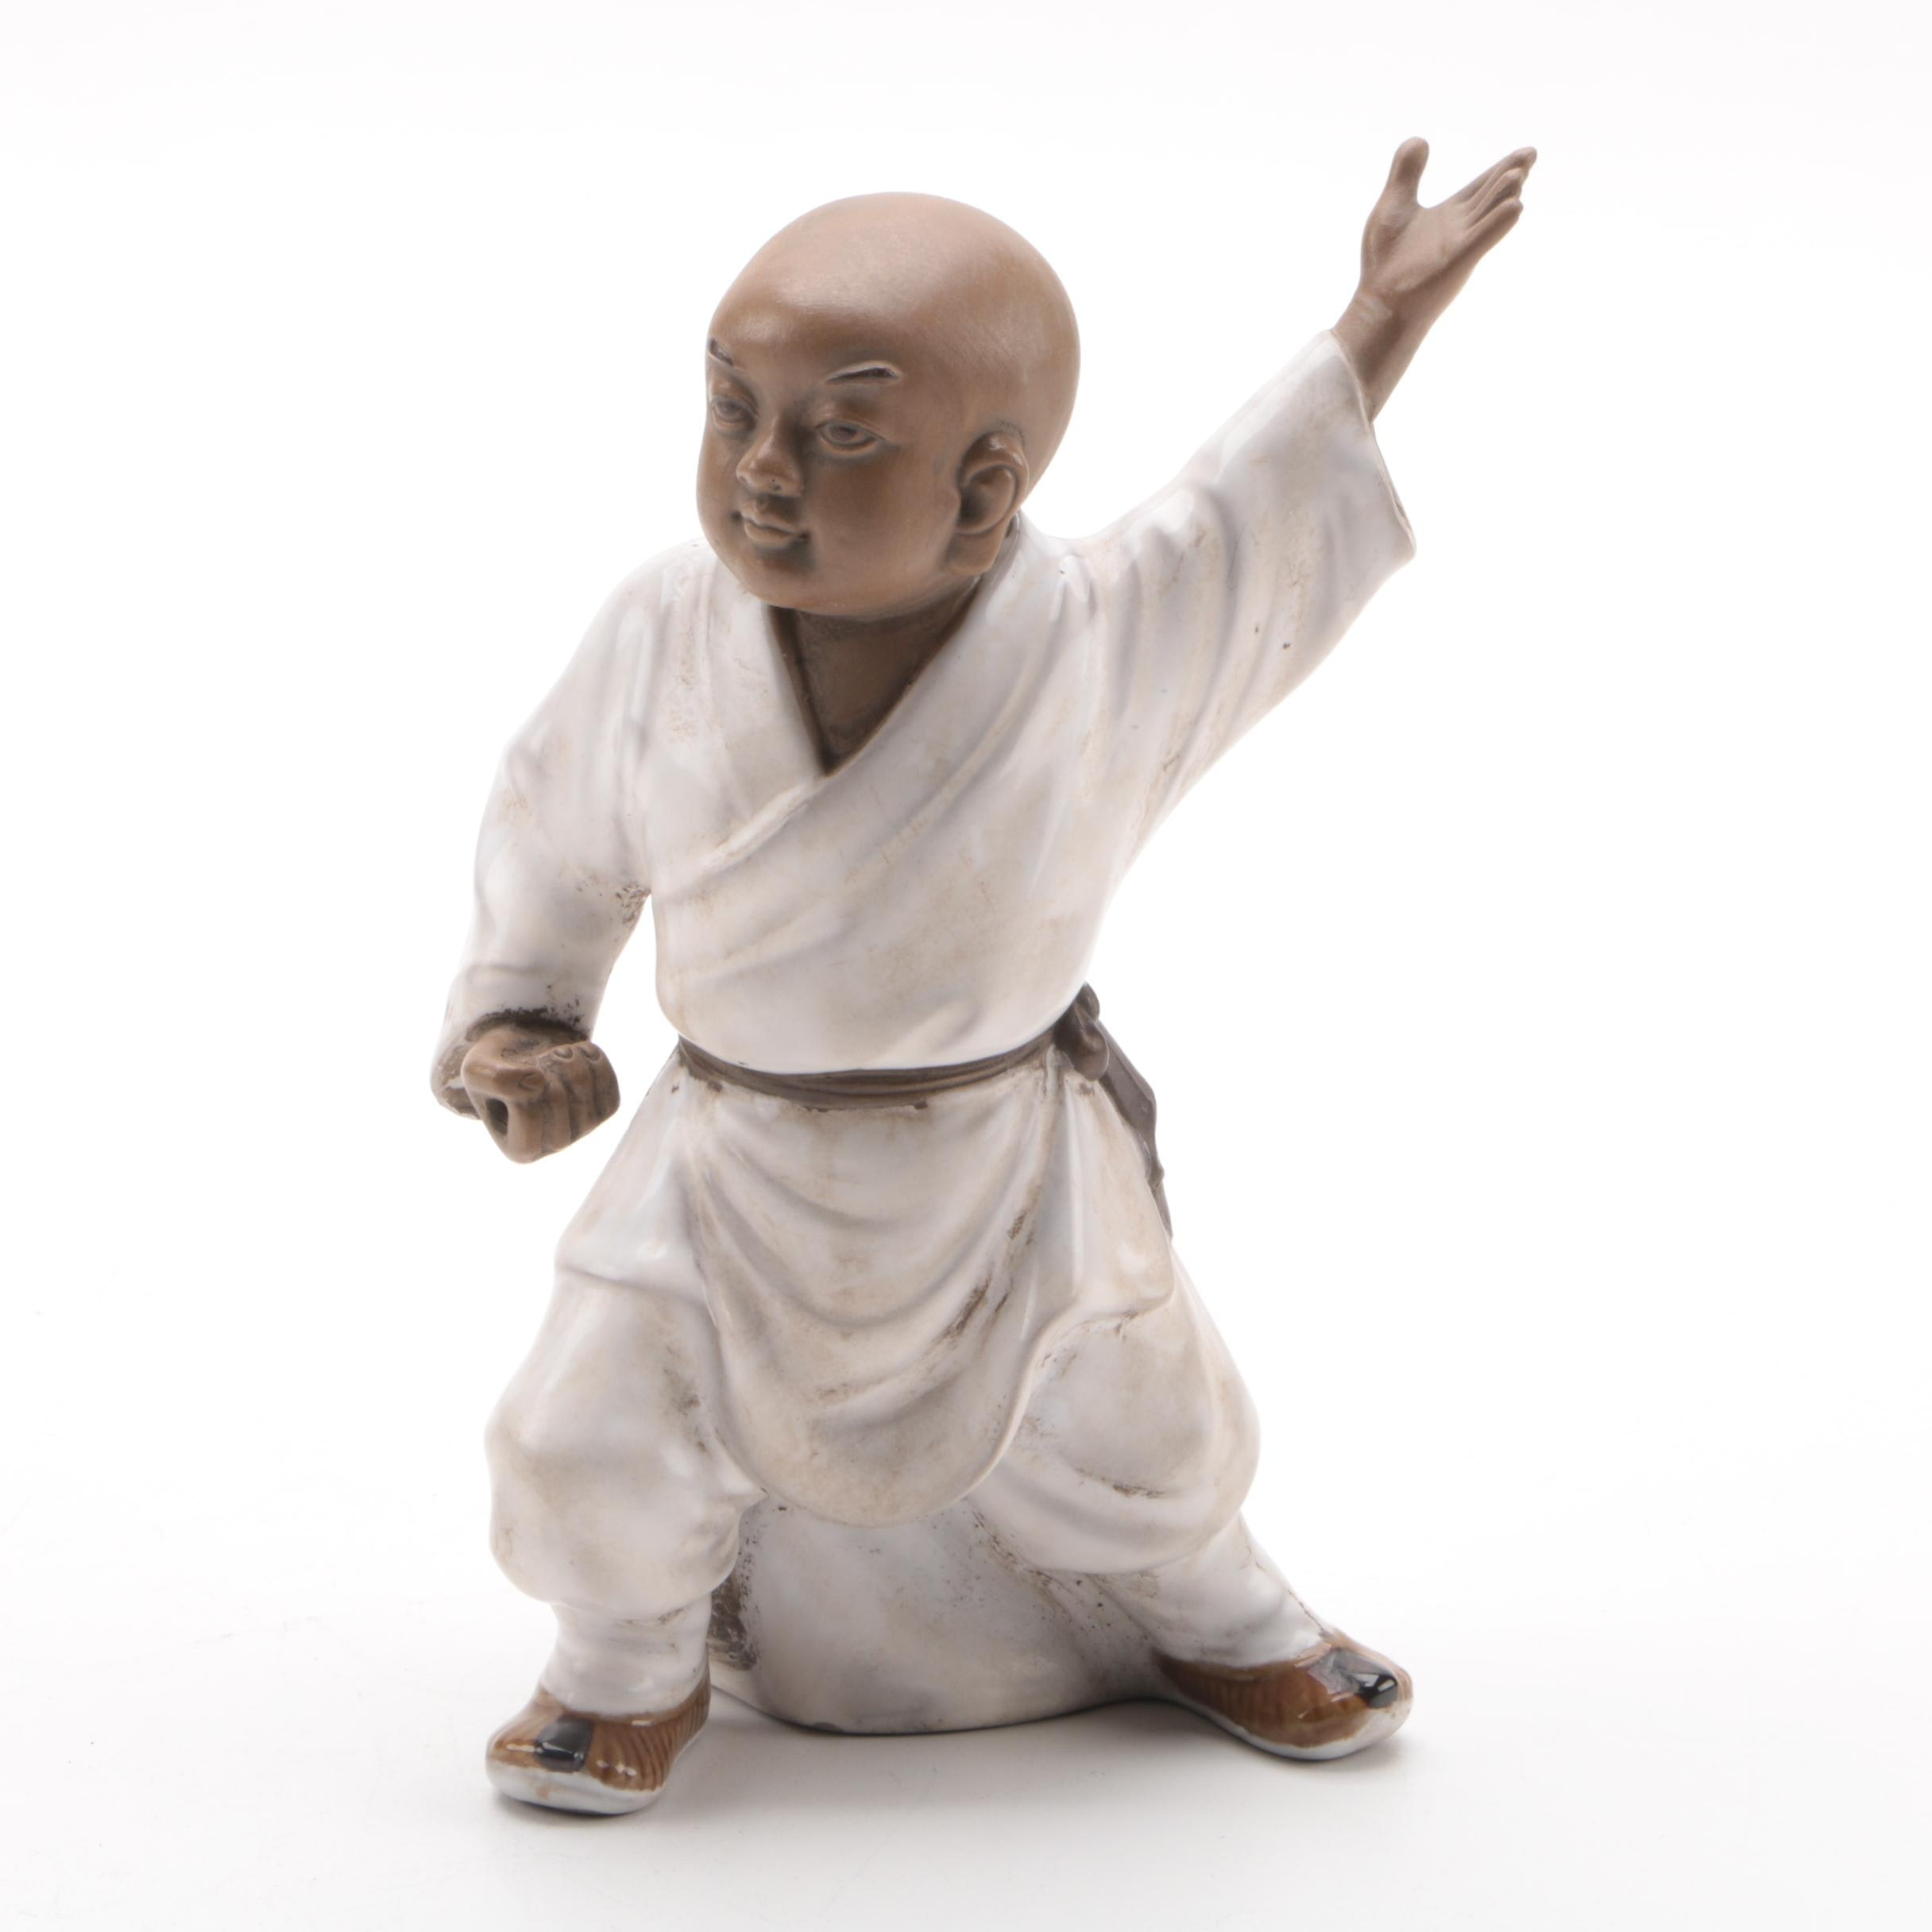 Chinese White Robed Martial Aritst Ceramic Figurine